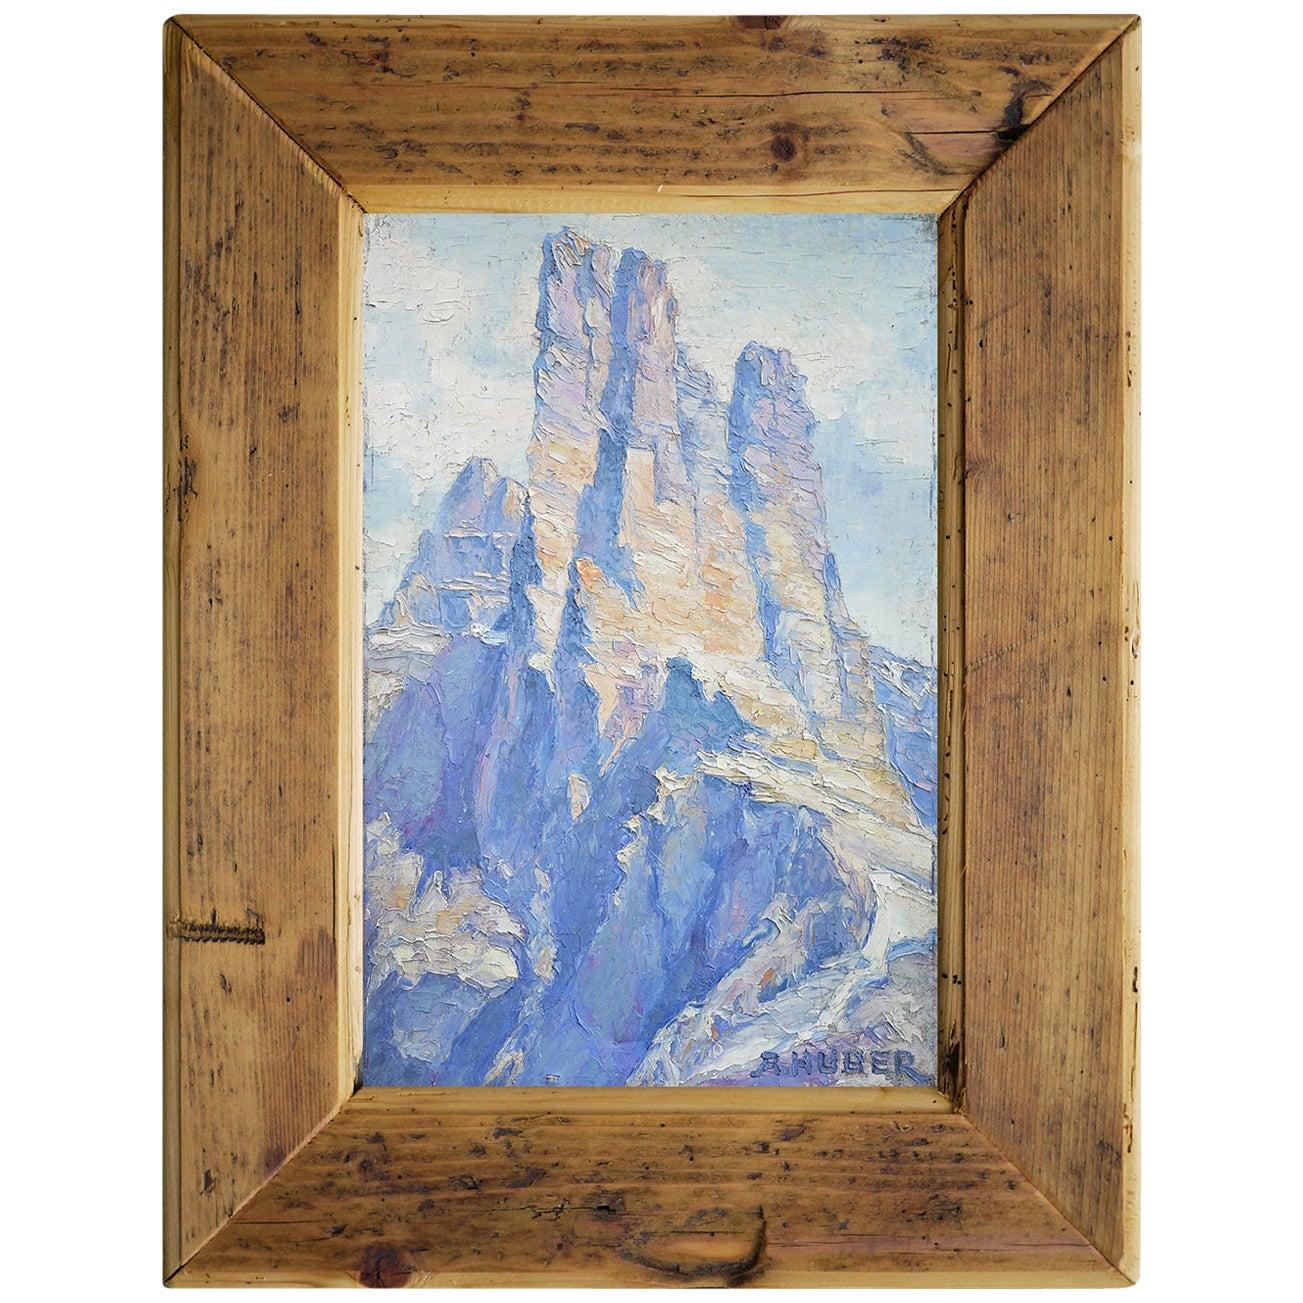 Mountain Painting, Italian Dolomites, Oil on Cardboard, A. Huber, 1940s